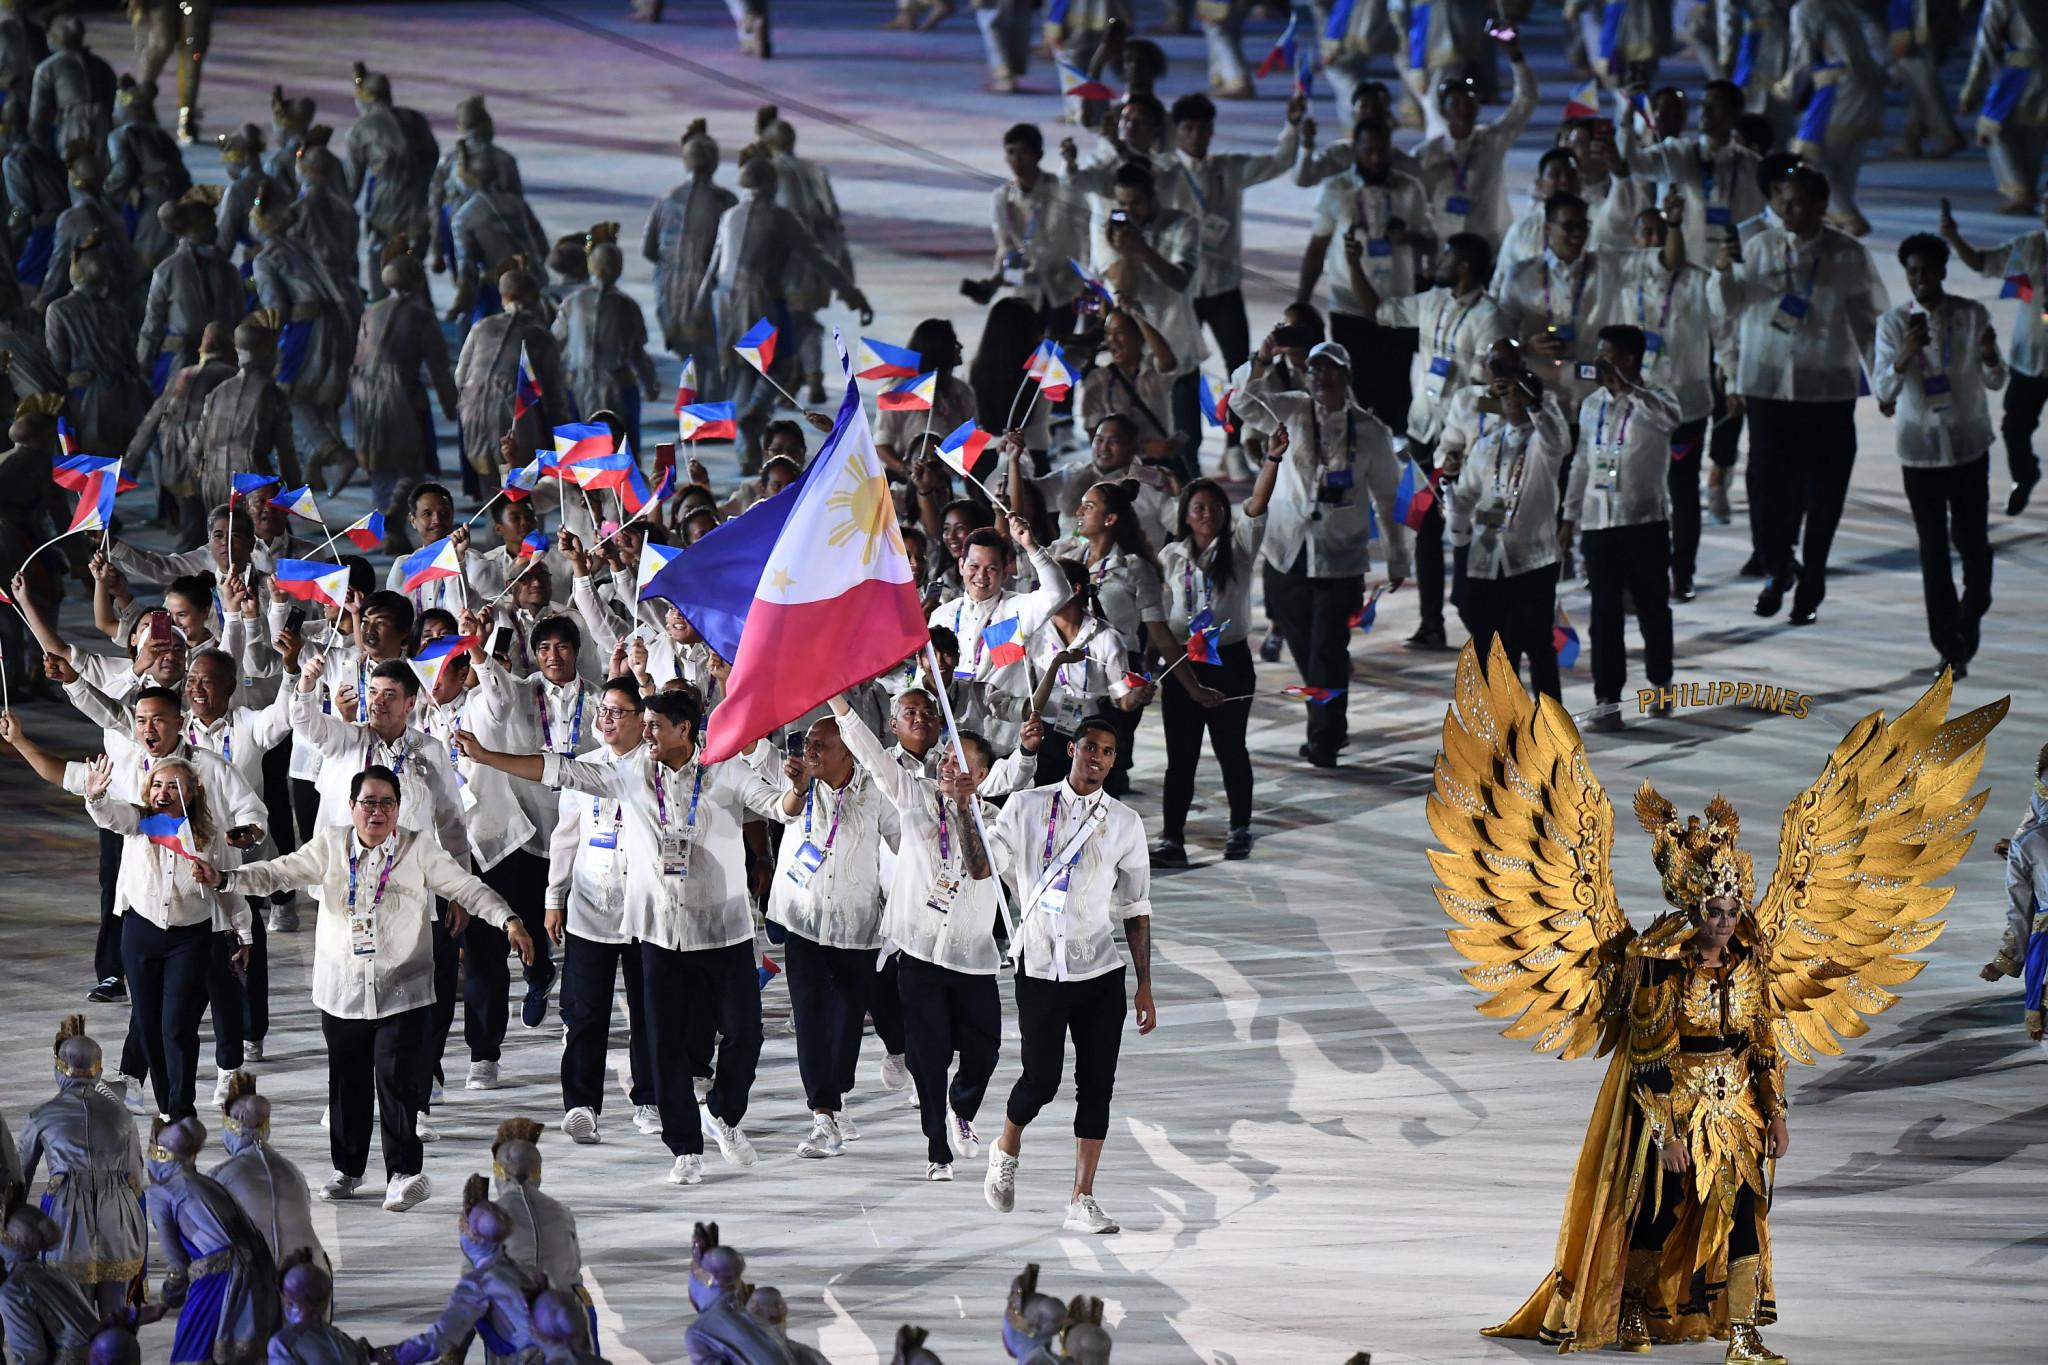 Philippines karateka face coronavirus-related visa issues ahead of Olympic qualifying tournament